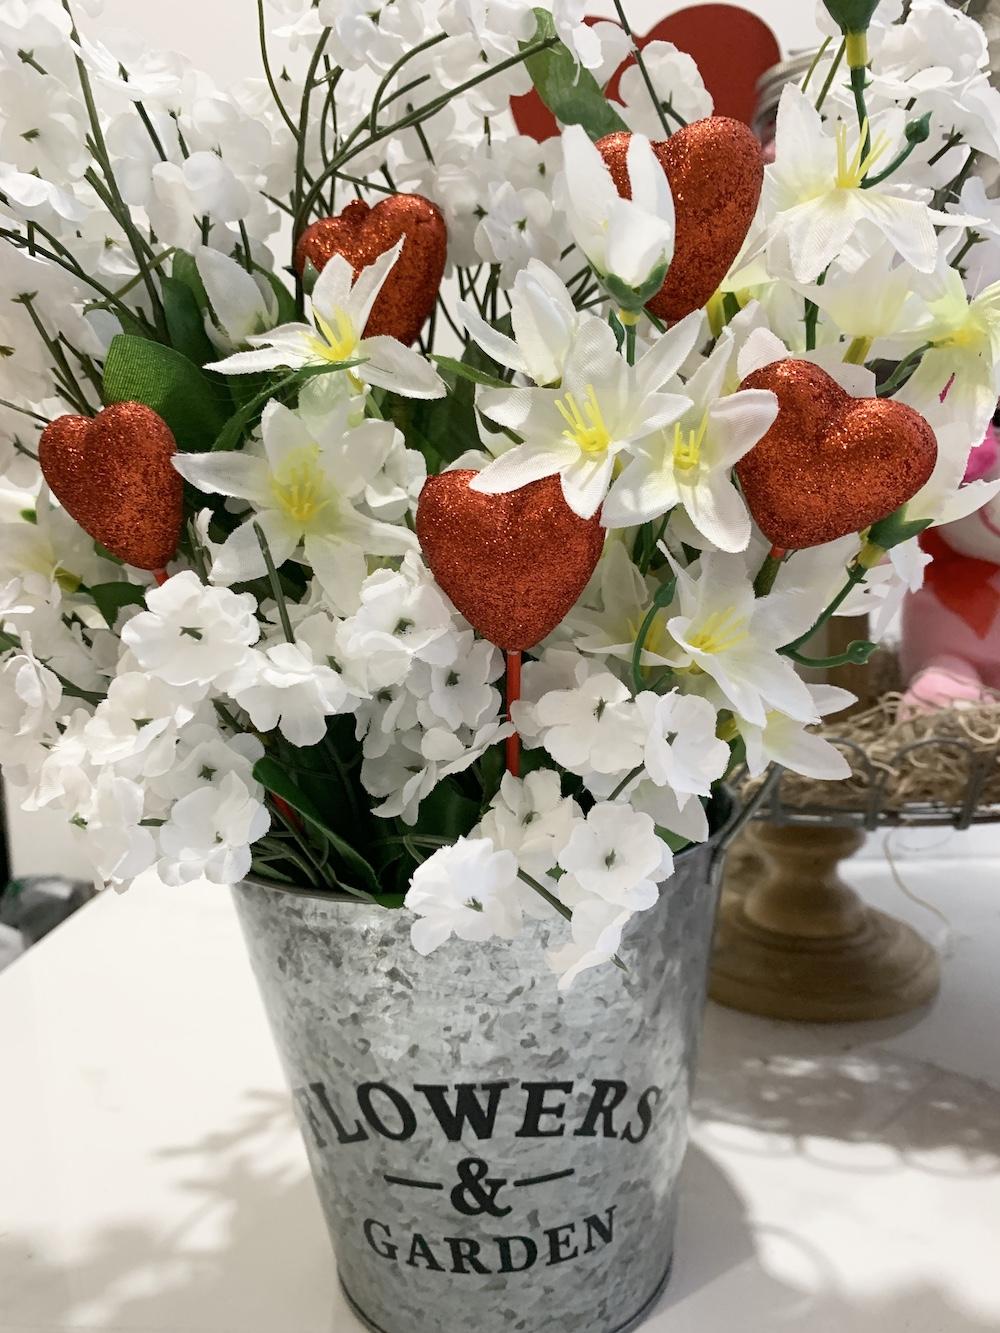 Valentine's Day Home Decor Heart Floral Bucket #Farmhouse #Affordable #SimpleDecor #QuickAndEasy #BudgetFriendly #Valentine #ValentinesDay #DIY #StValentinesDecor #FarmhouseDecor